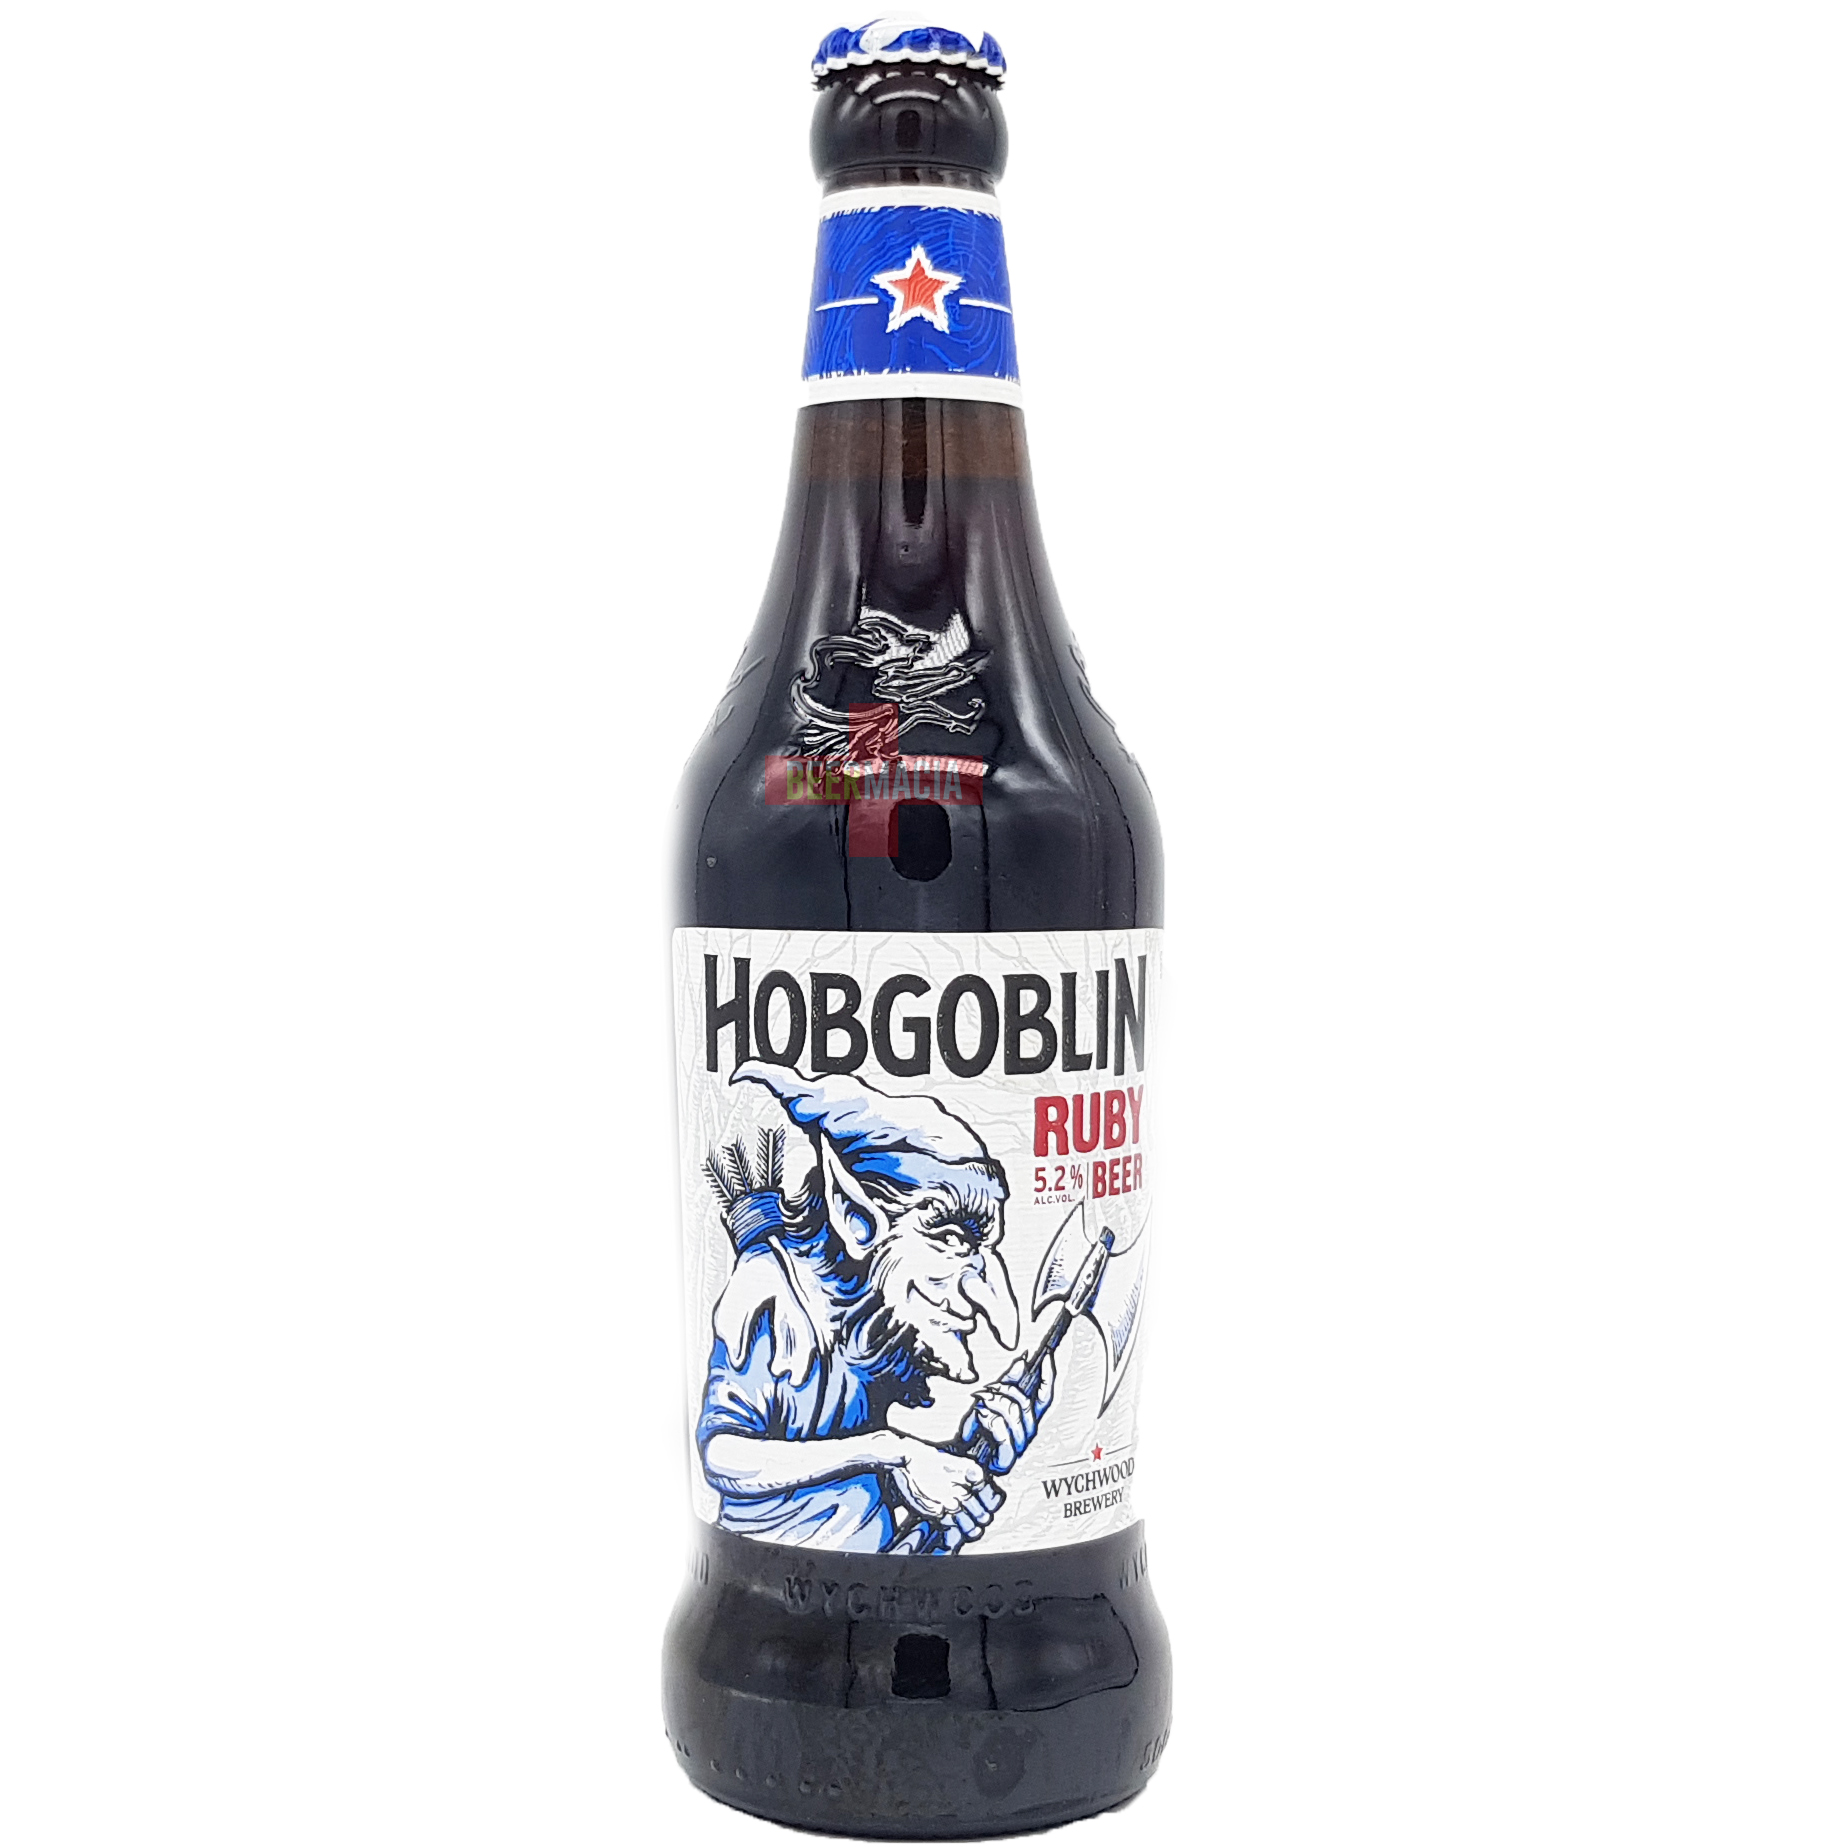 Wychwood Brewery - Hobgoblin Legendary Ruby Beer 50cl